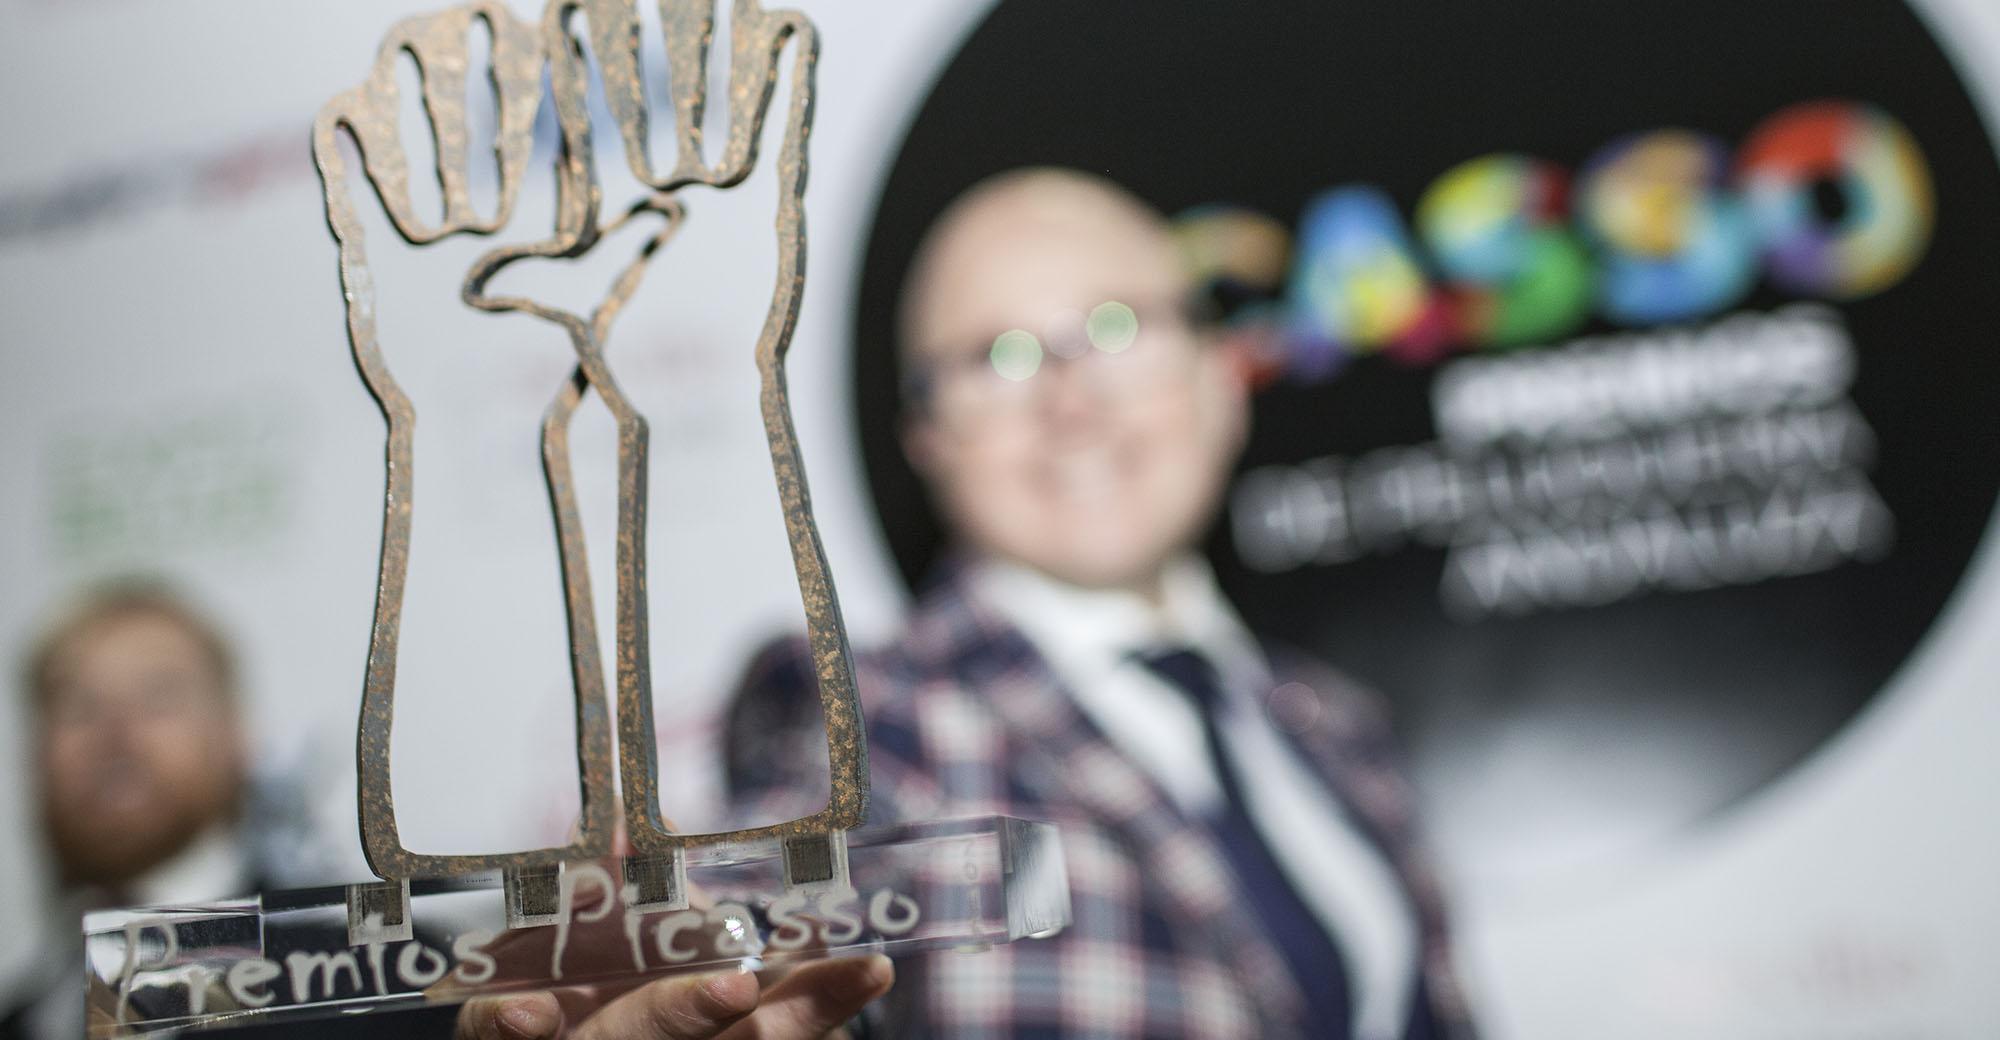 Premios Picasso-tpl